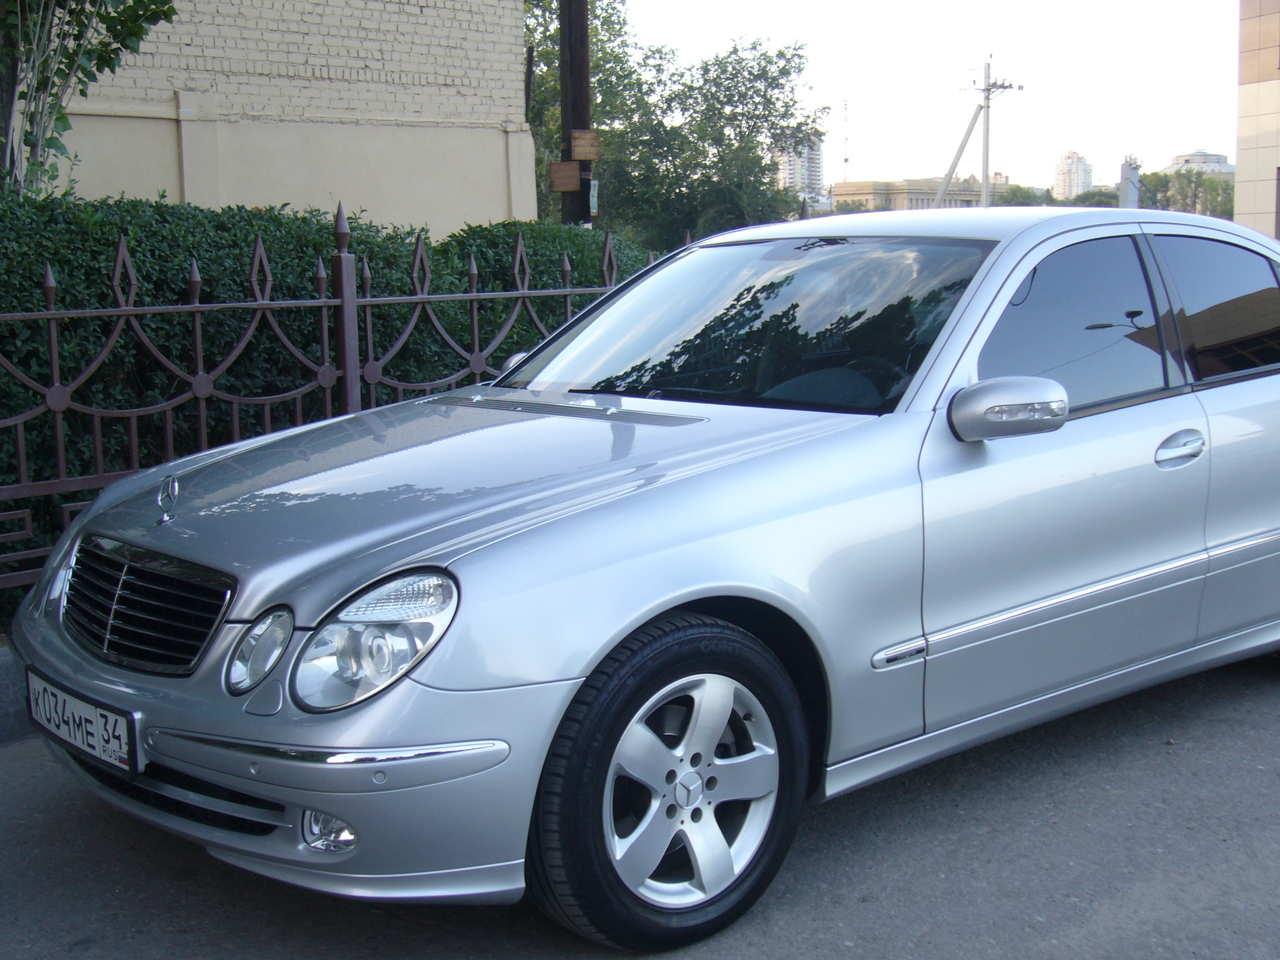 2005 mercedes e class partsopen for Mercedes benz 2005 e320 parts